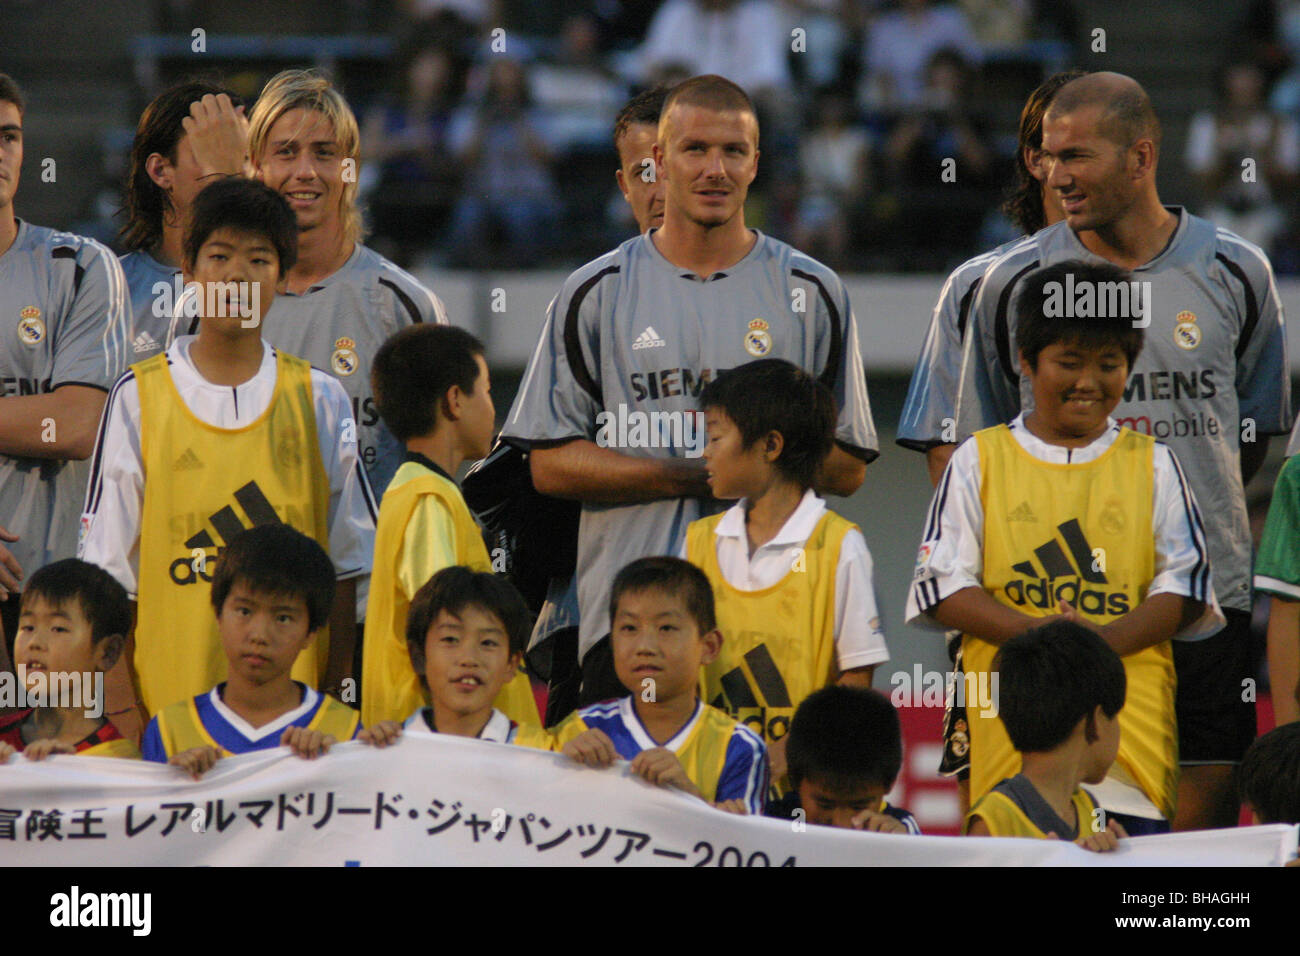 Jose Maria Gutierrez, David Beckham, Zinedine Zidane at Real Madrid training session, Tokyo, Japan. - Stock Image